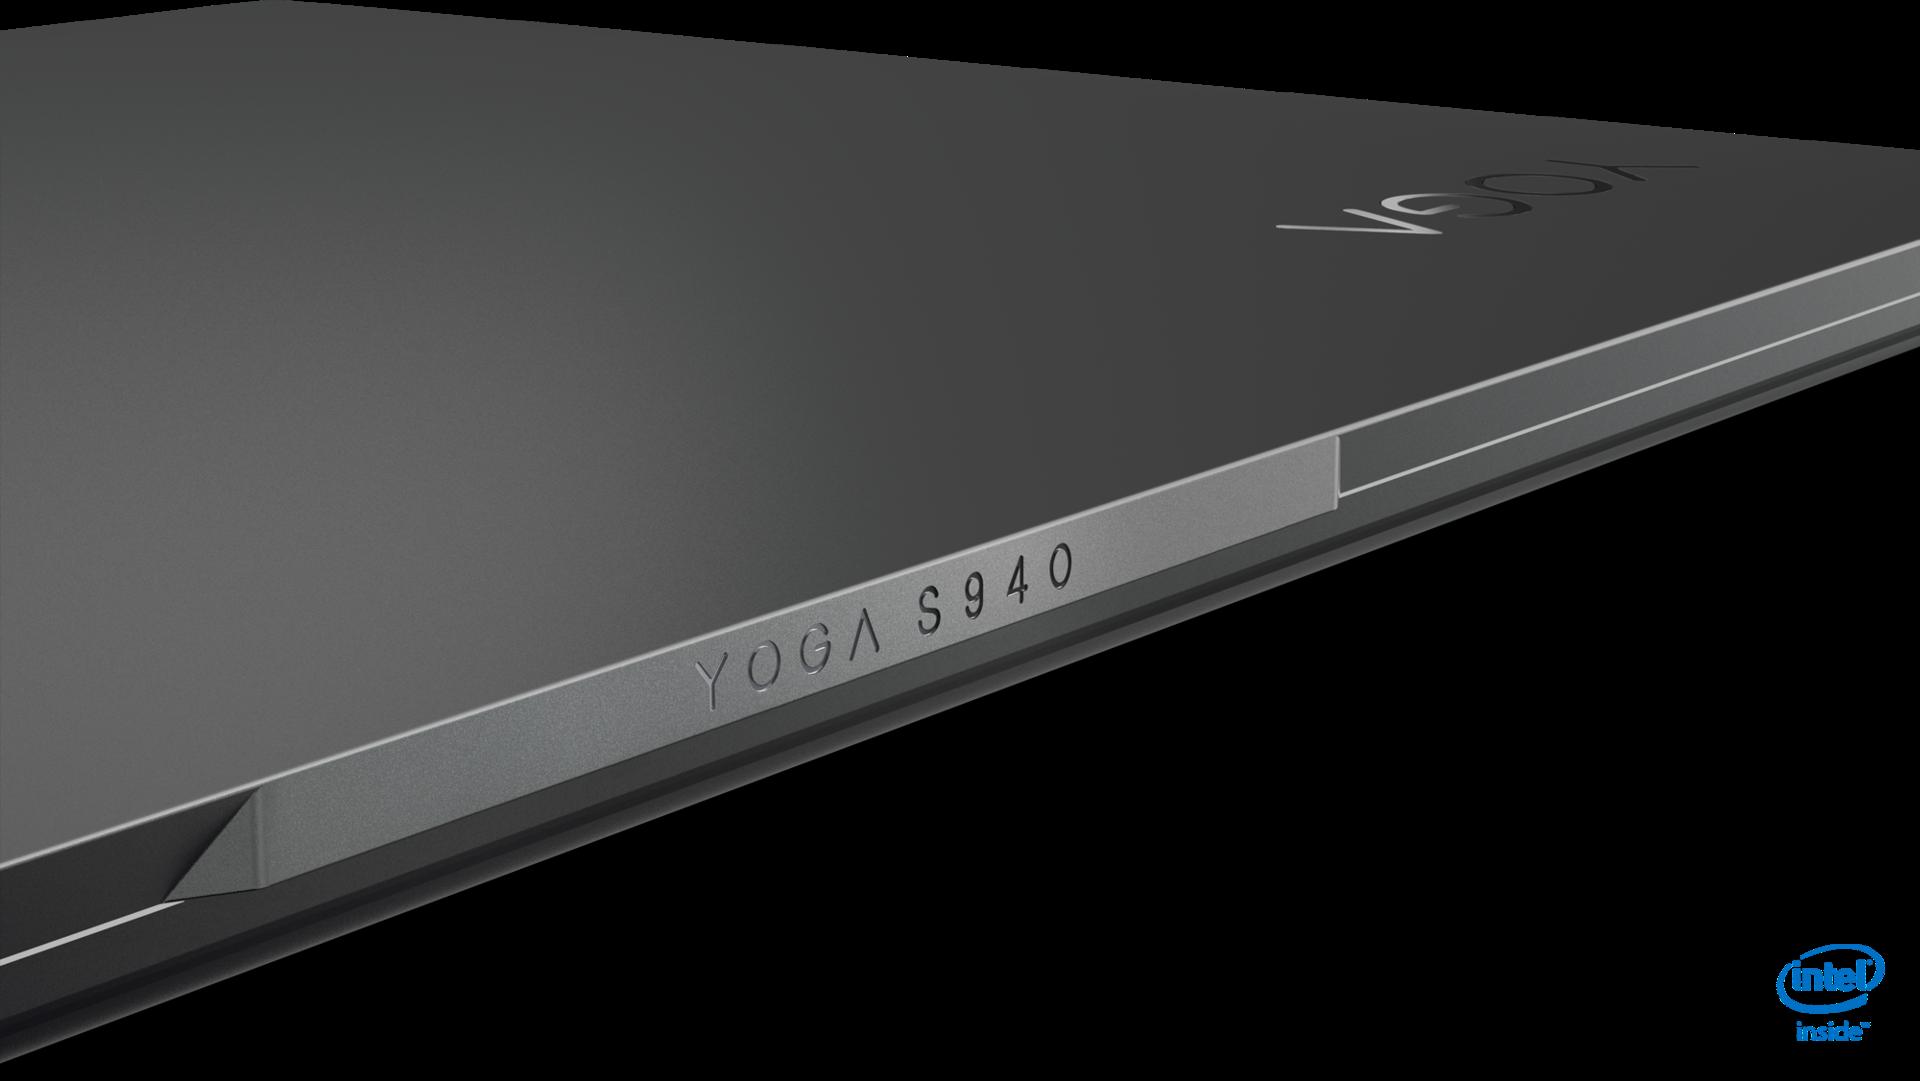 Lenovo Yoga S940 Ultrathin Premium Yoga Laptop Includes A